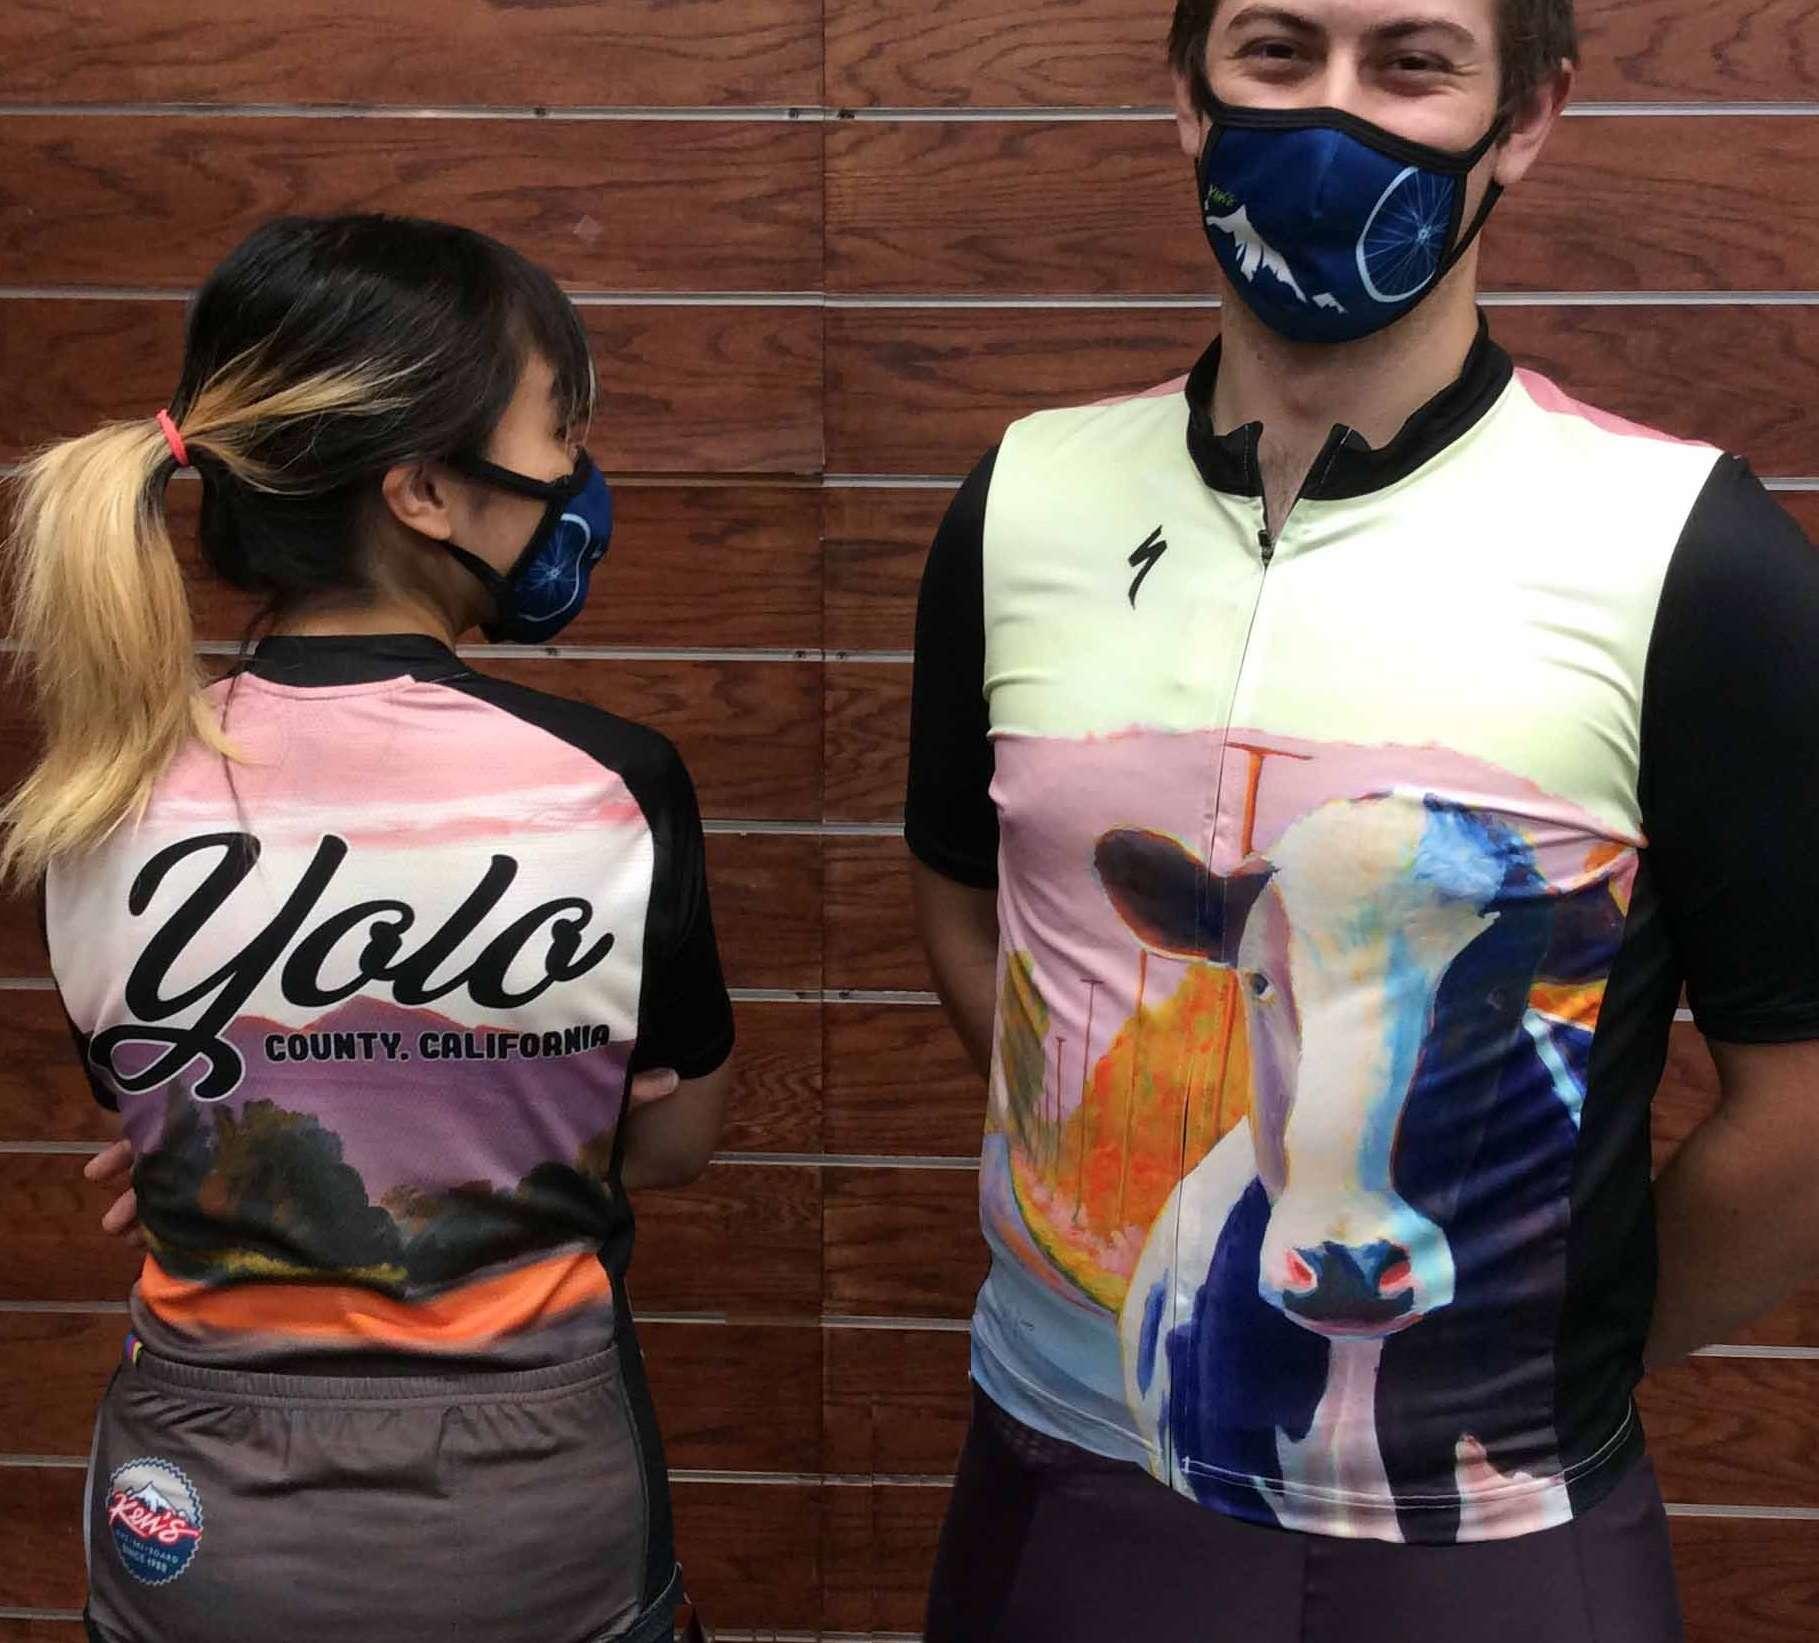 Yolo Ken's cycling jersey